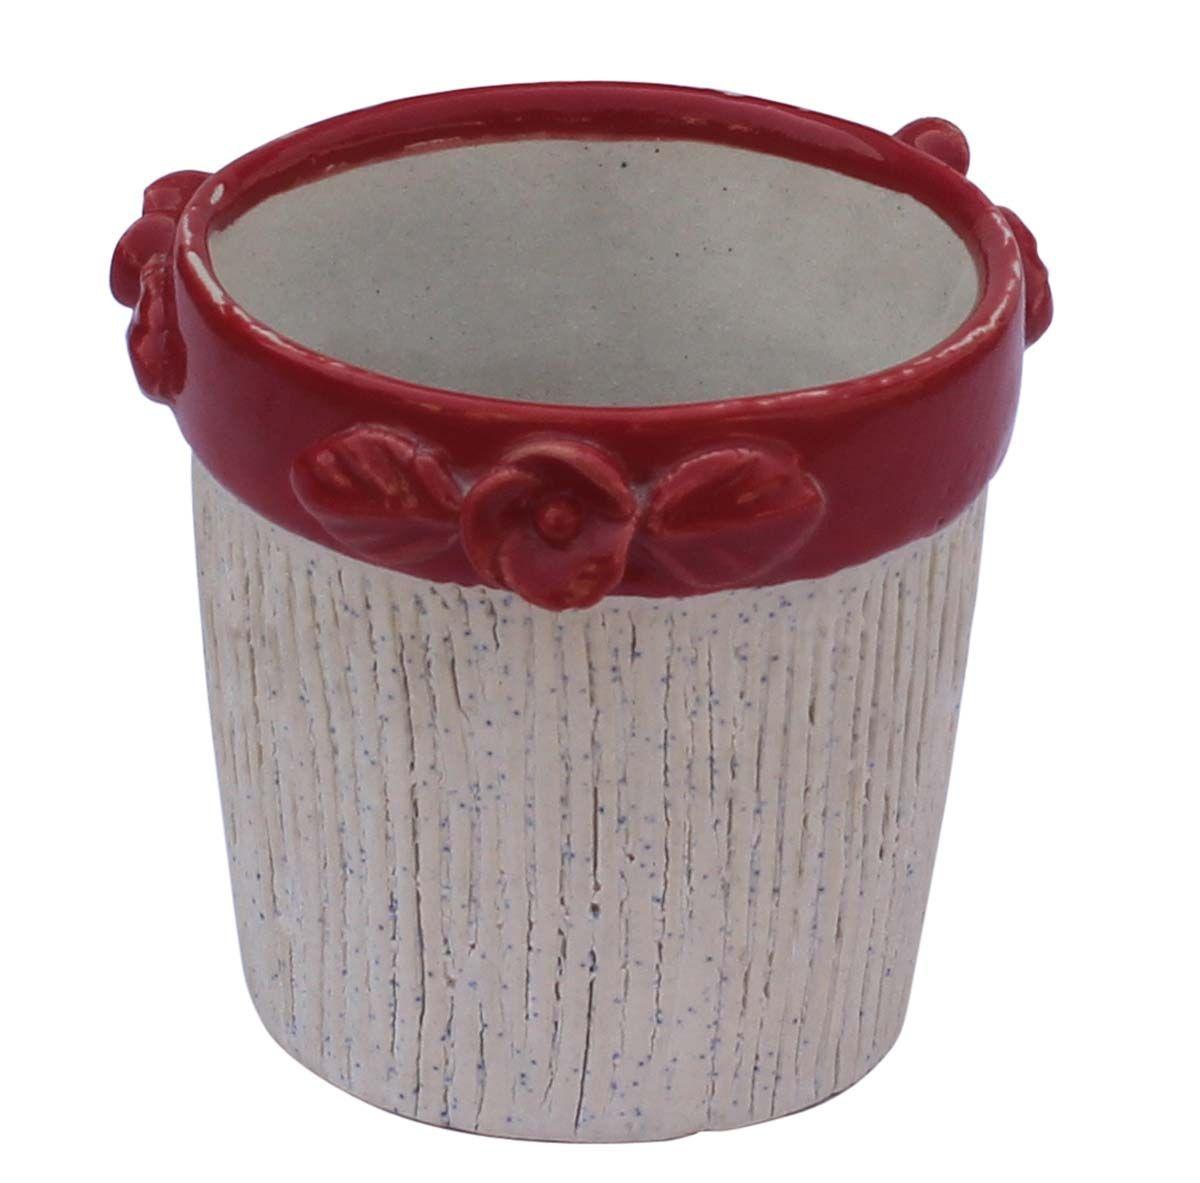 bulk wholesale ceramic planting pot - handmade white & red